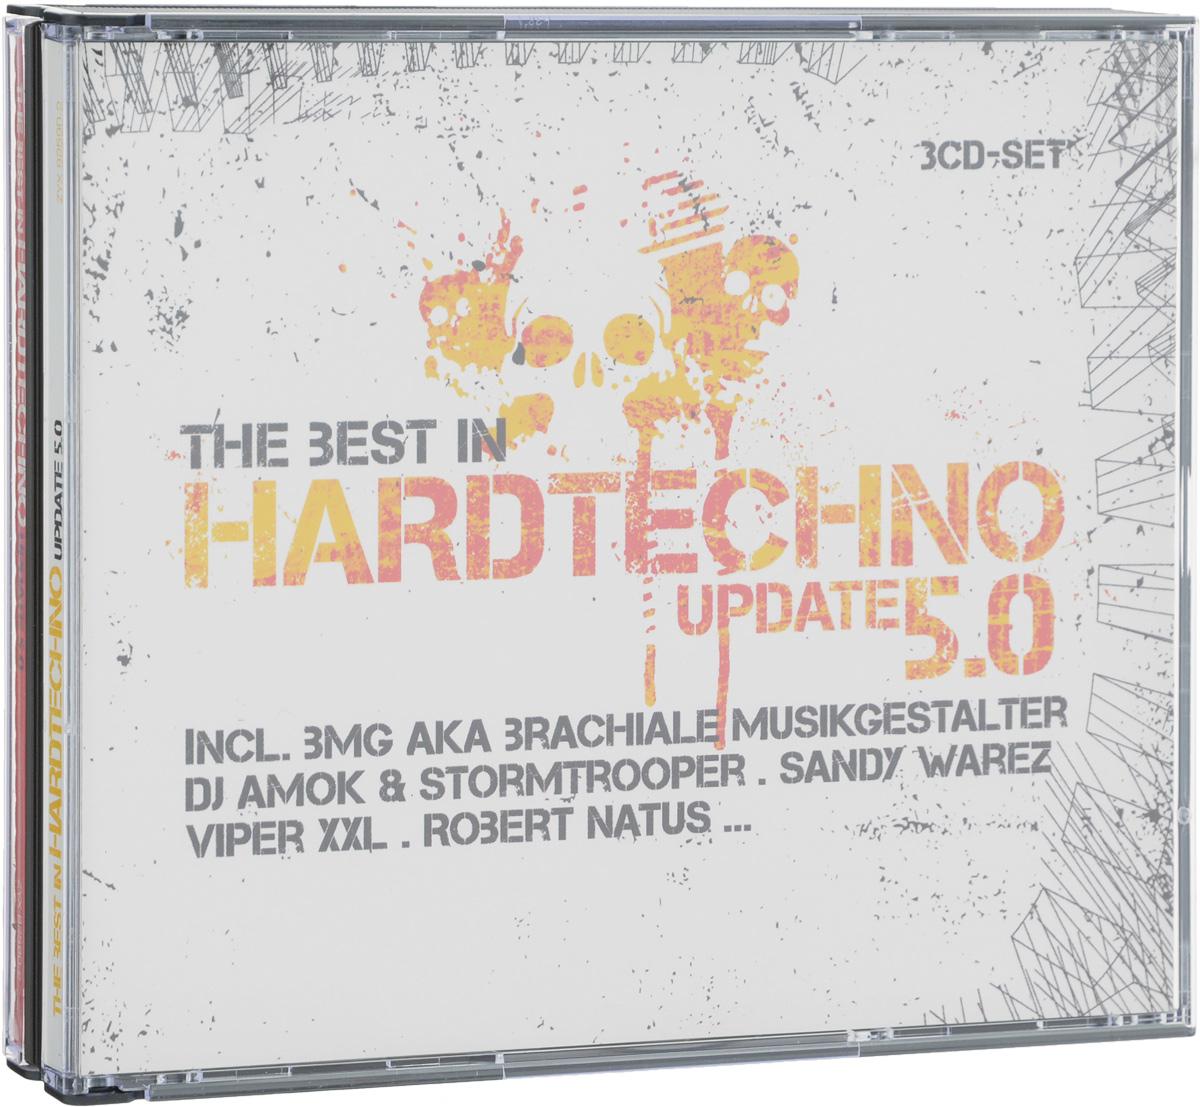 The Best In Hardtechno. Update 5.0 (3 CD) михаил плетнев филип лейджер роджер норрингтон джон нельсон сабин мейер best adagios 50 3 cd